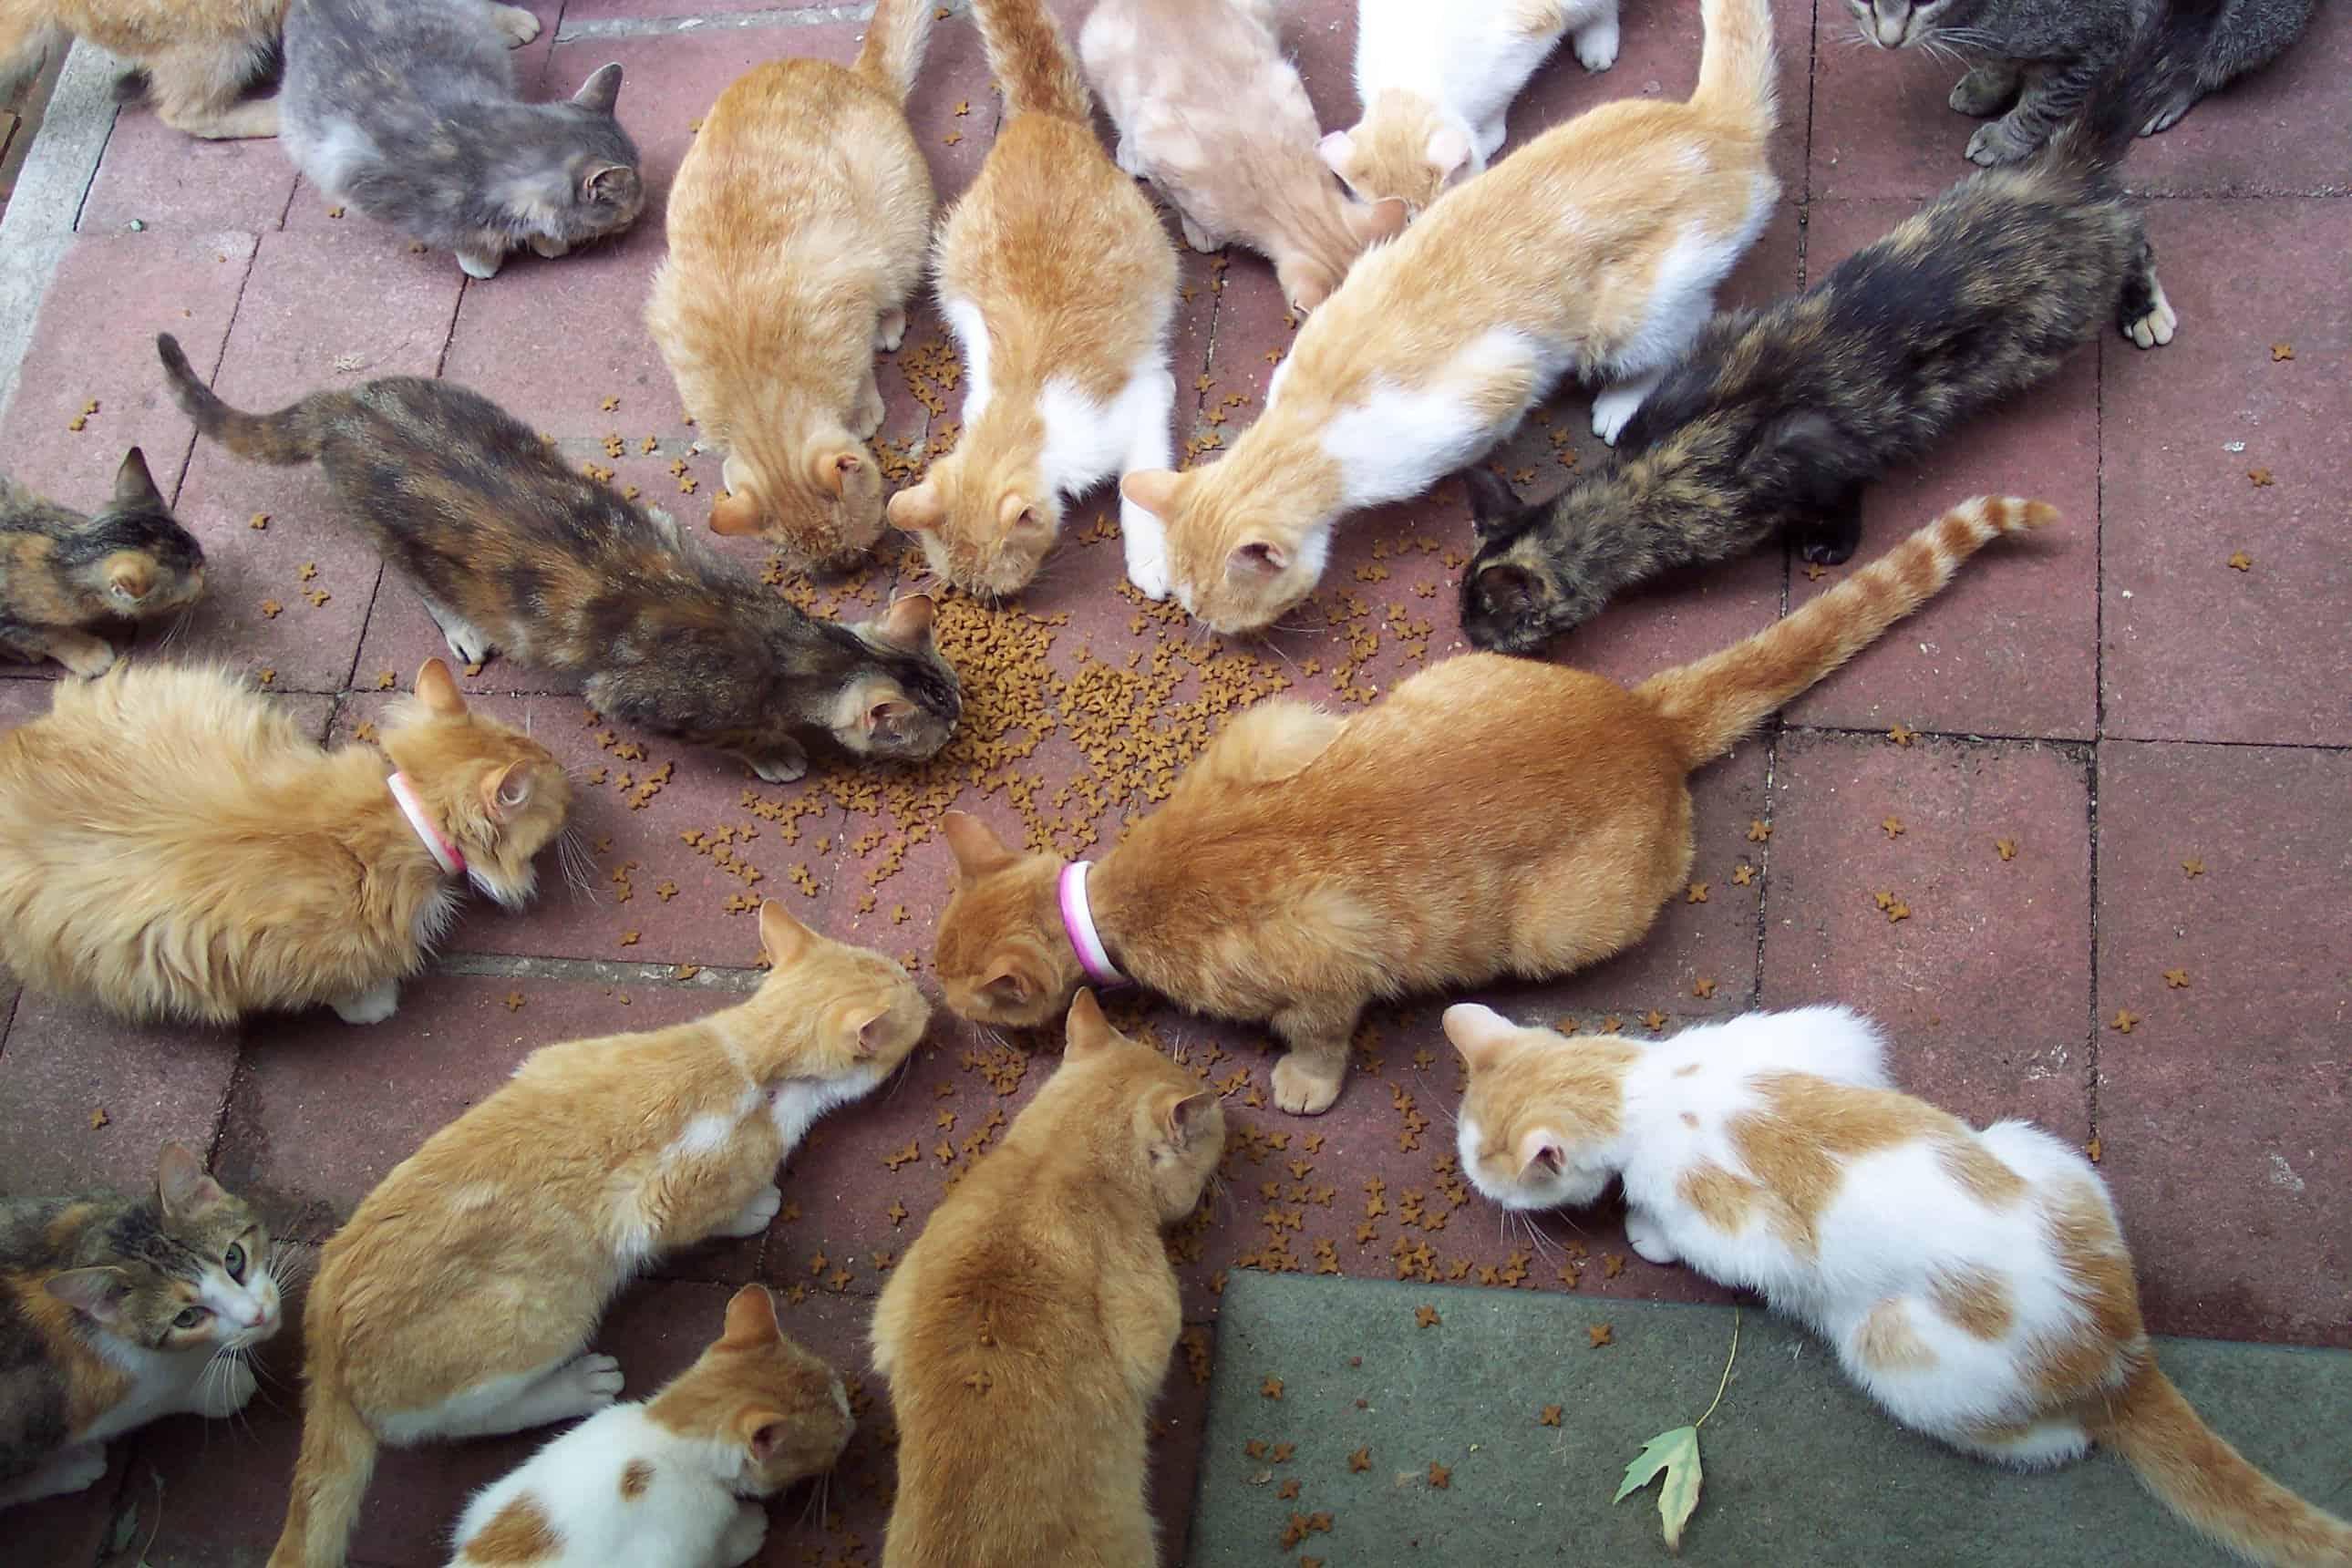 Animal cruelty prevention month april 2018 i love veterinary